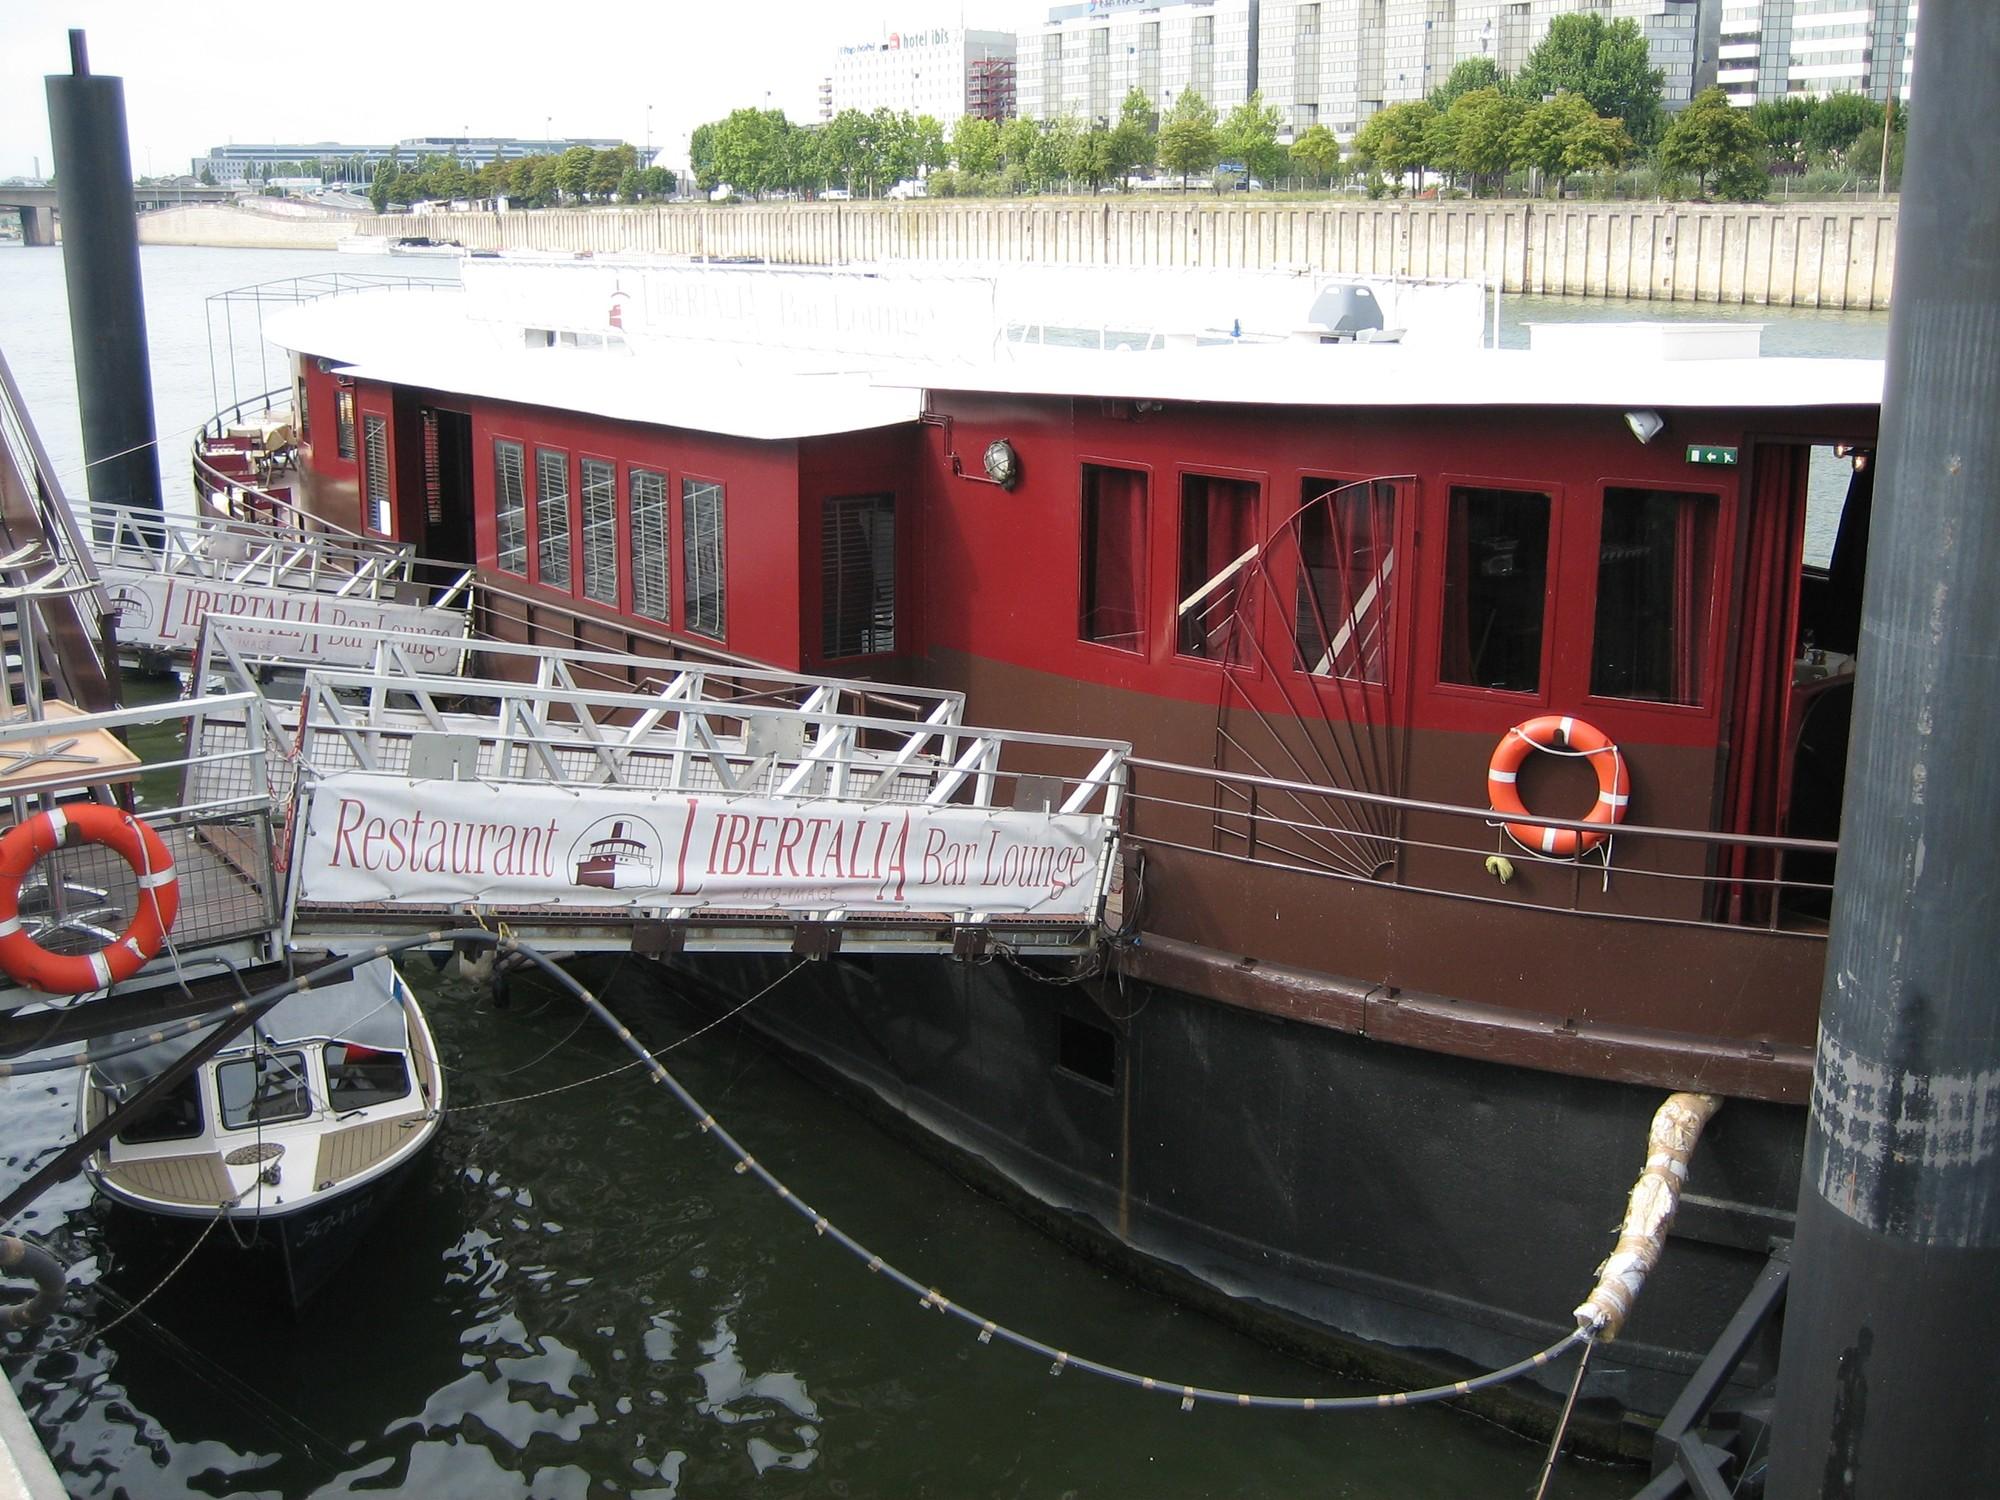 bateau-libertalia-ivry-passerelle-3